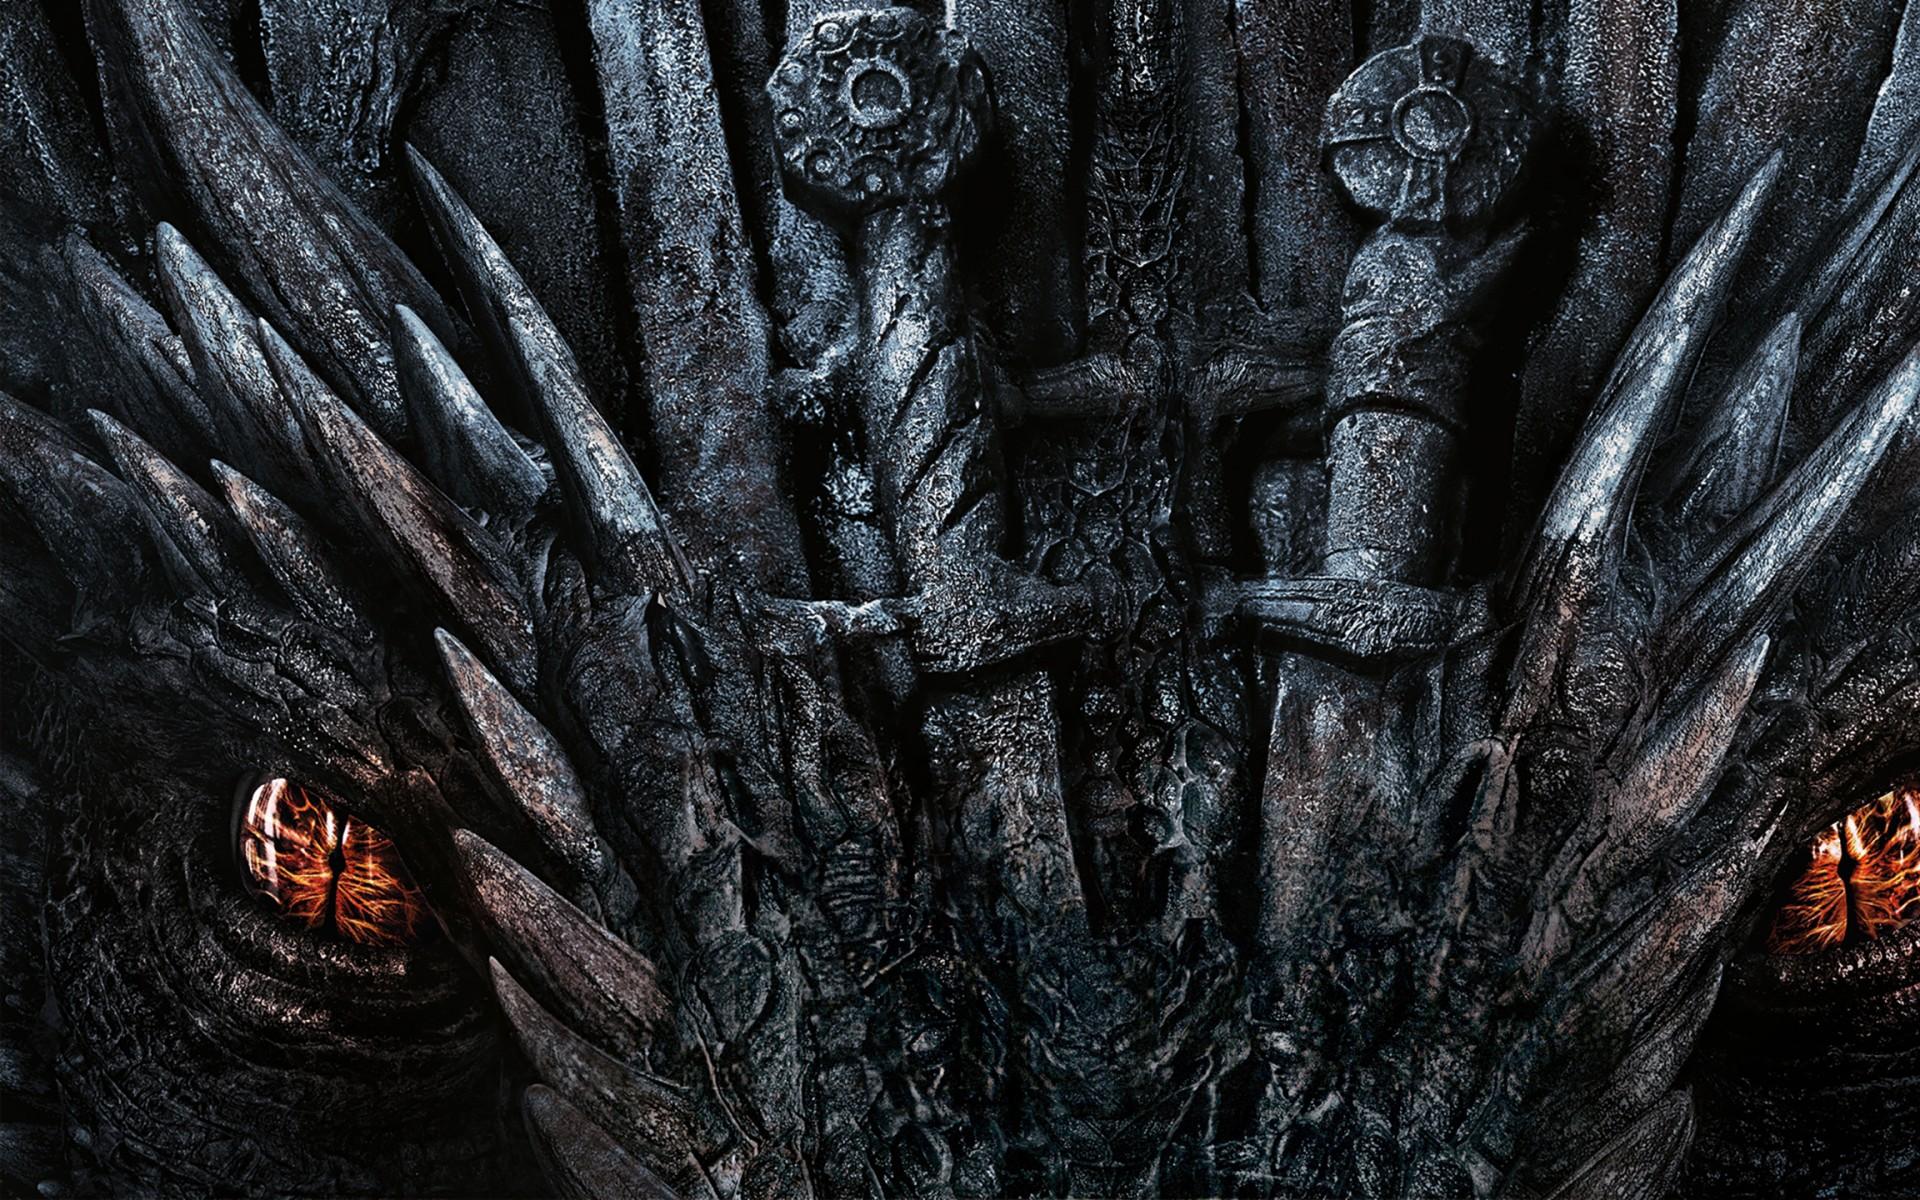 Dragon Game Of Thrones Season 8